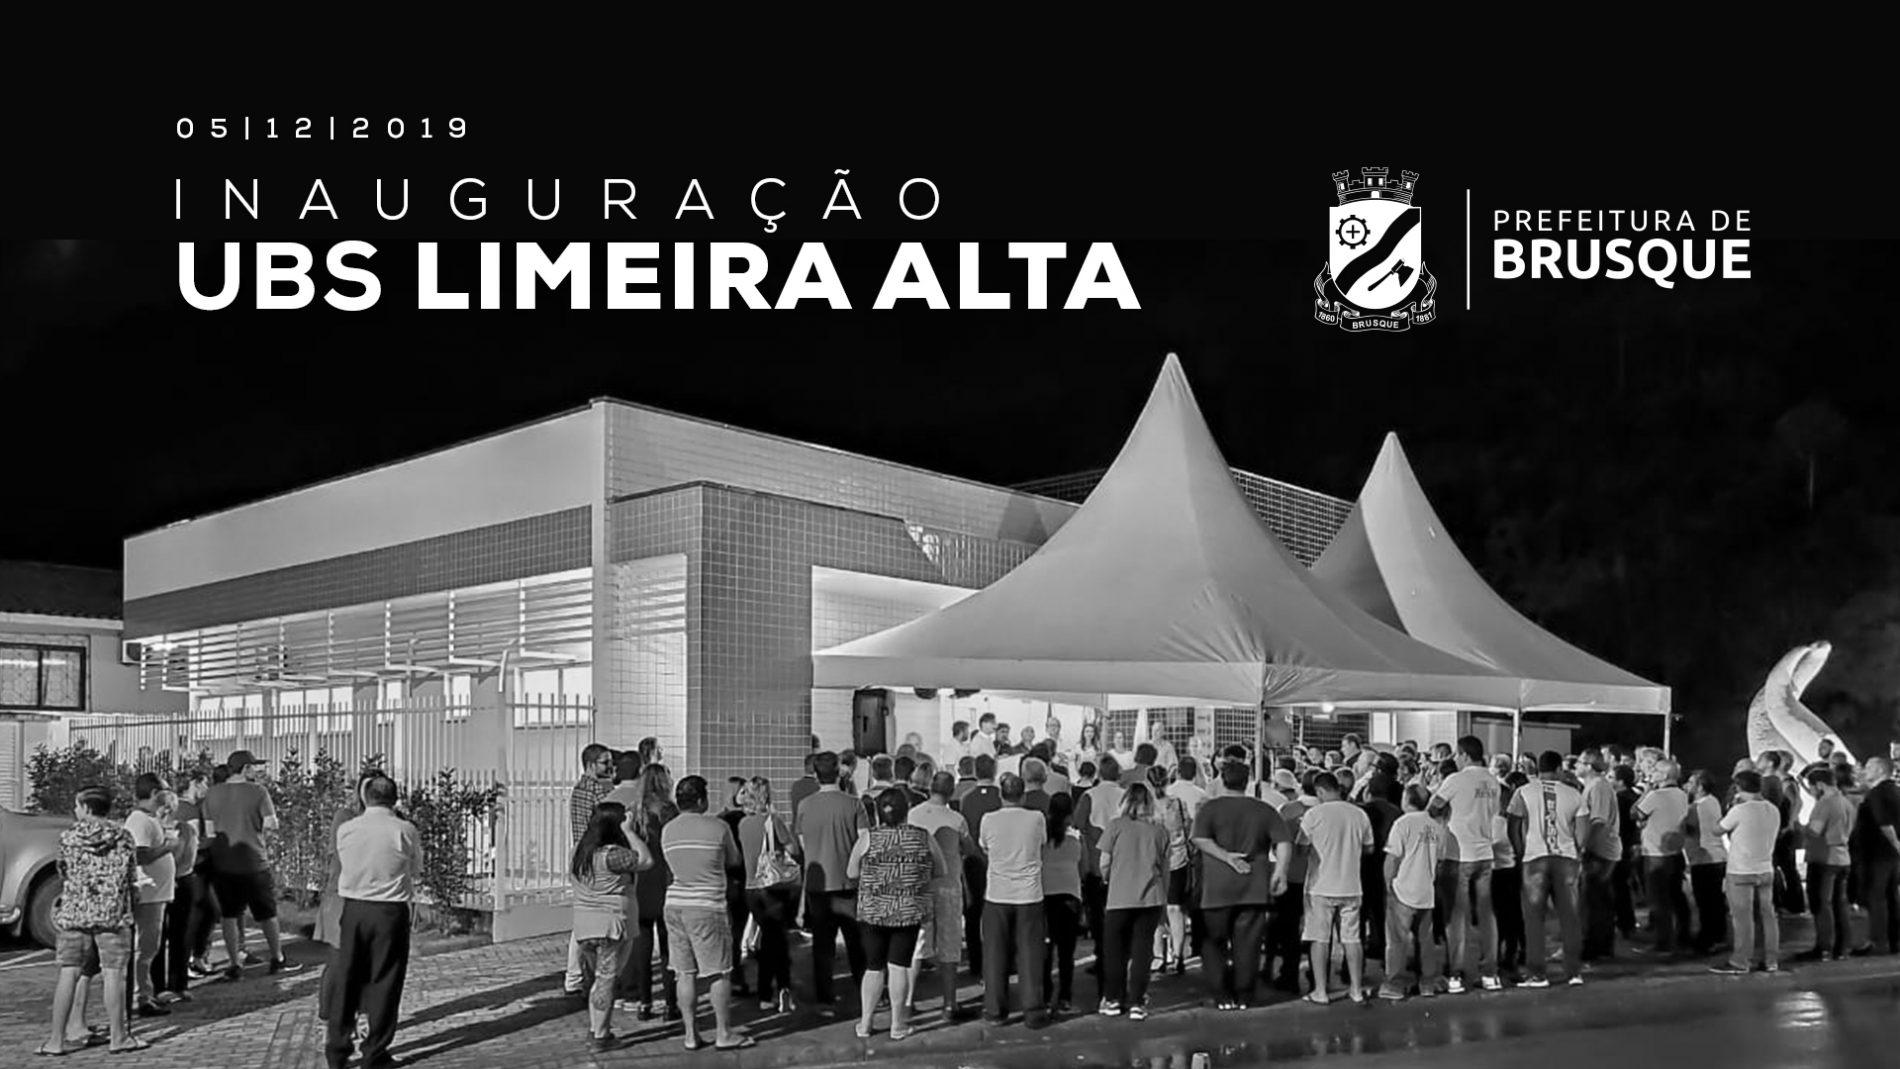 Prefeitura de Brusque inaugura UBS Limeira Alta